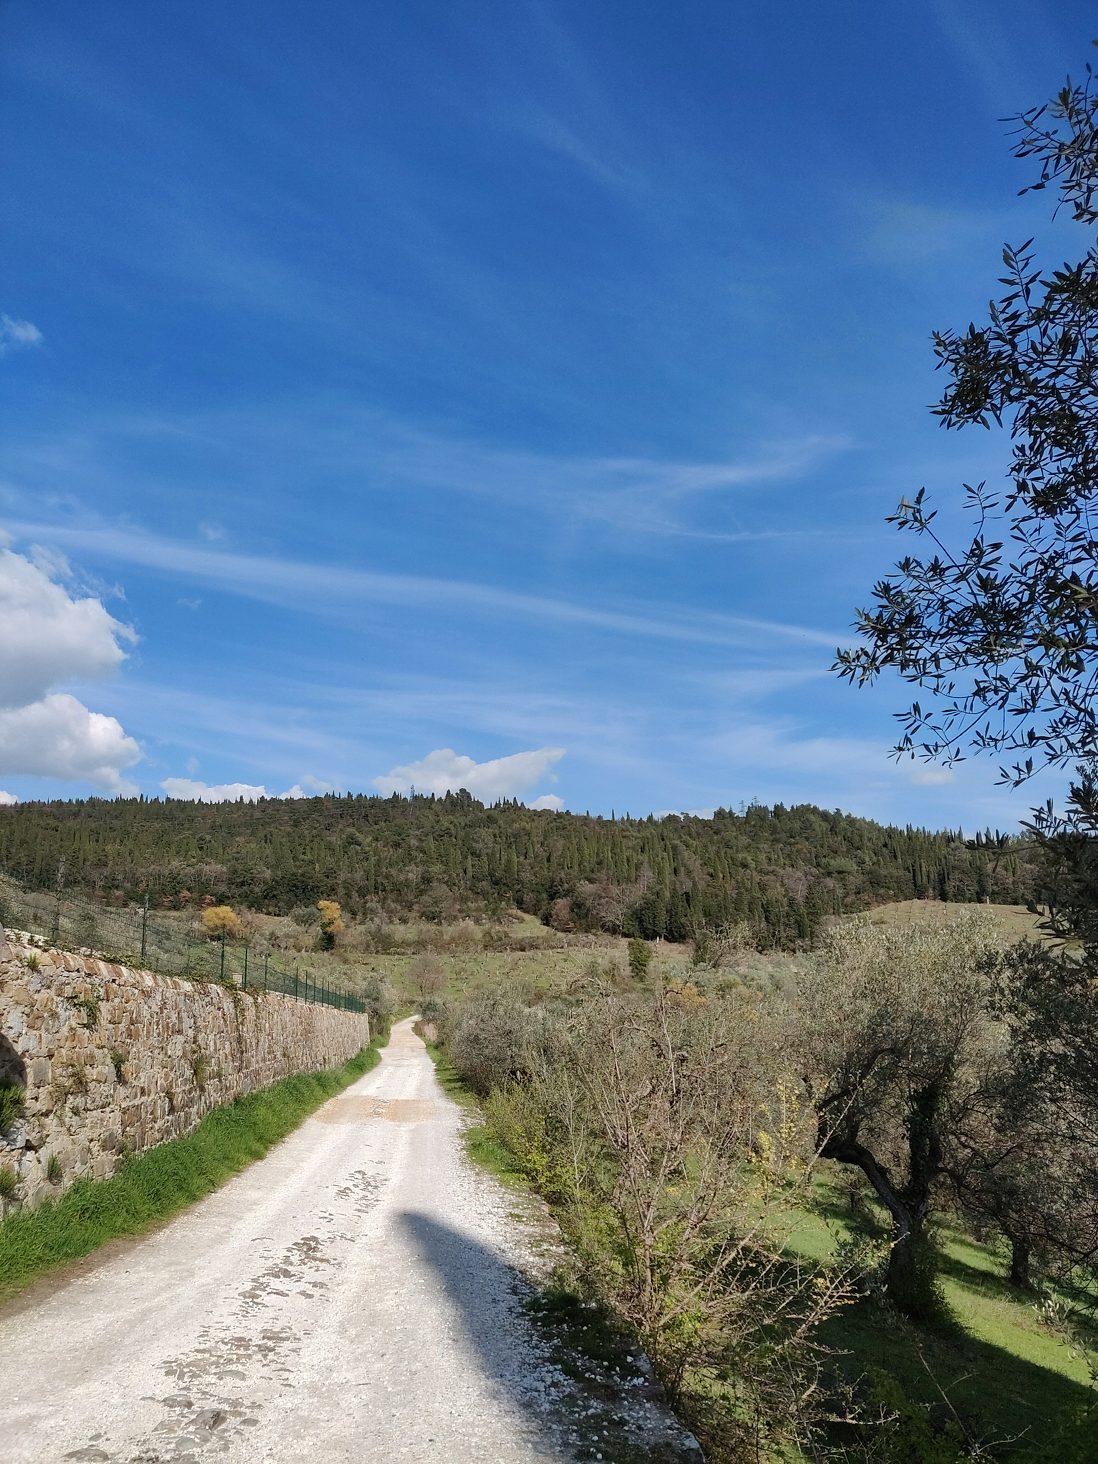 OnePlus 6 Landscape Photo